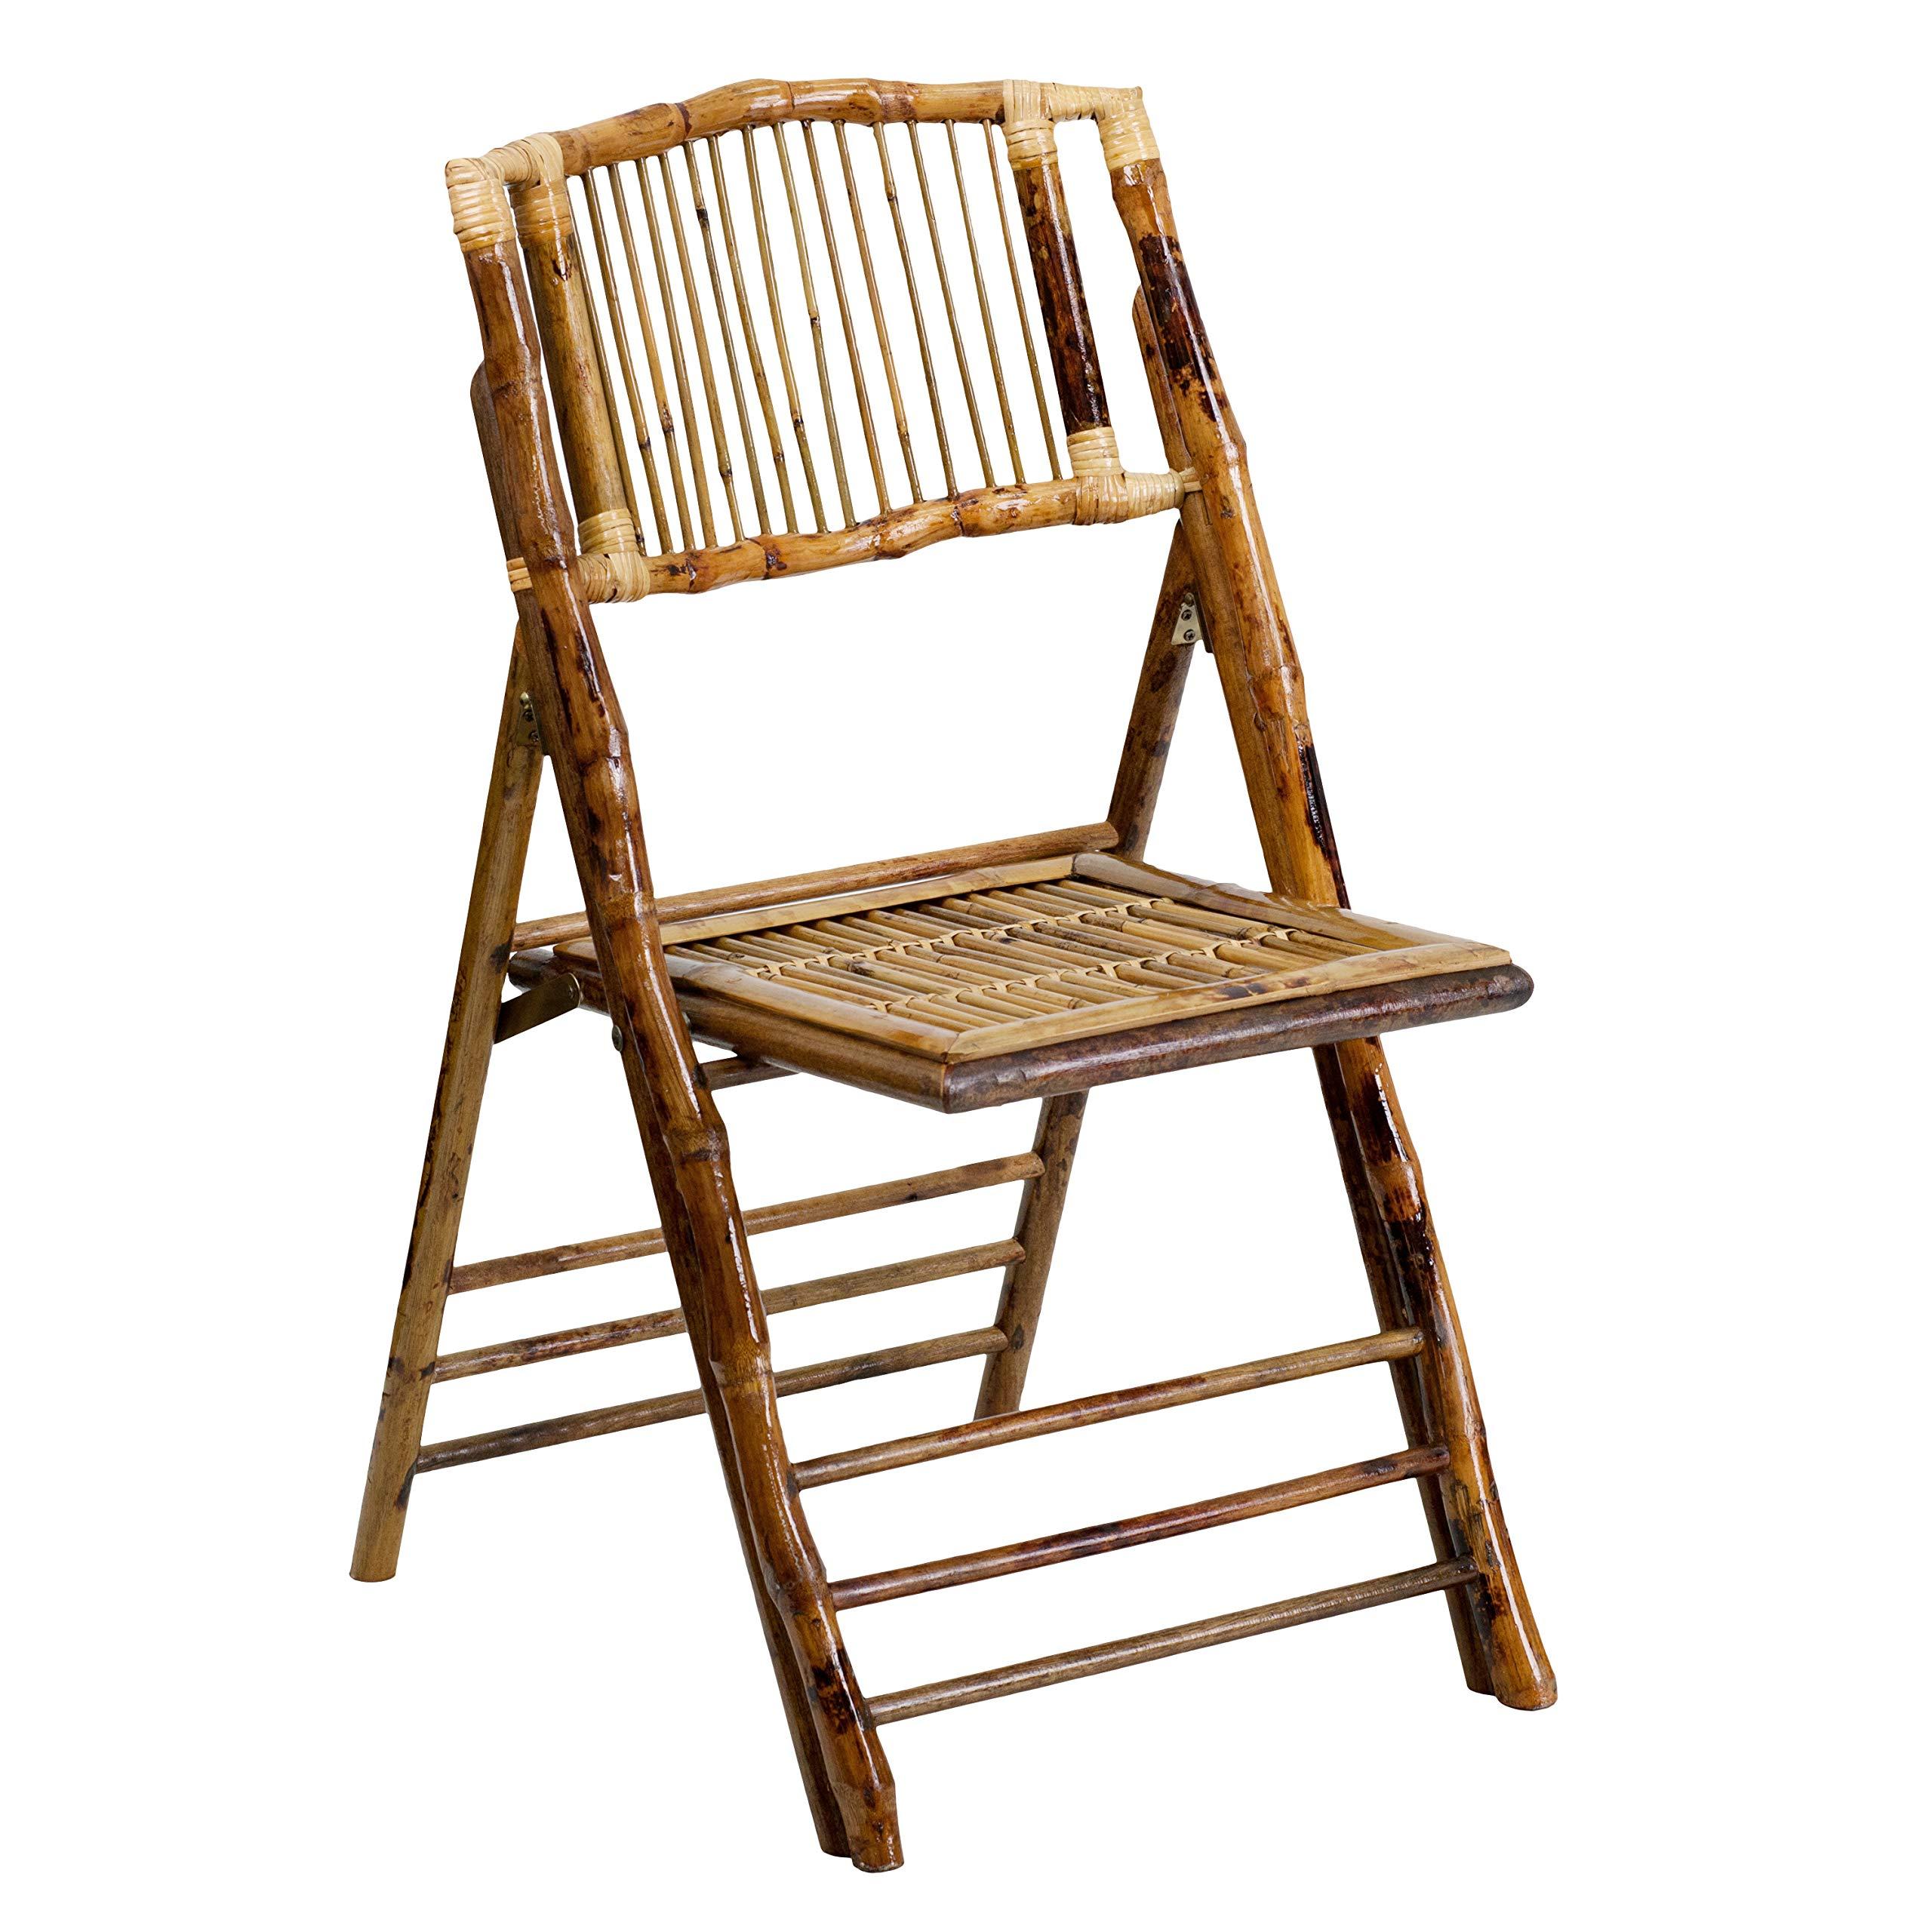 Flash Furniture American Champion Bamboo Folding Chair by Flash Furniture